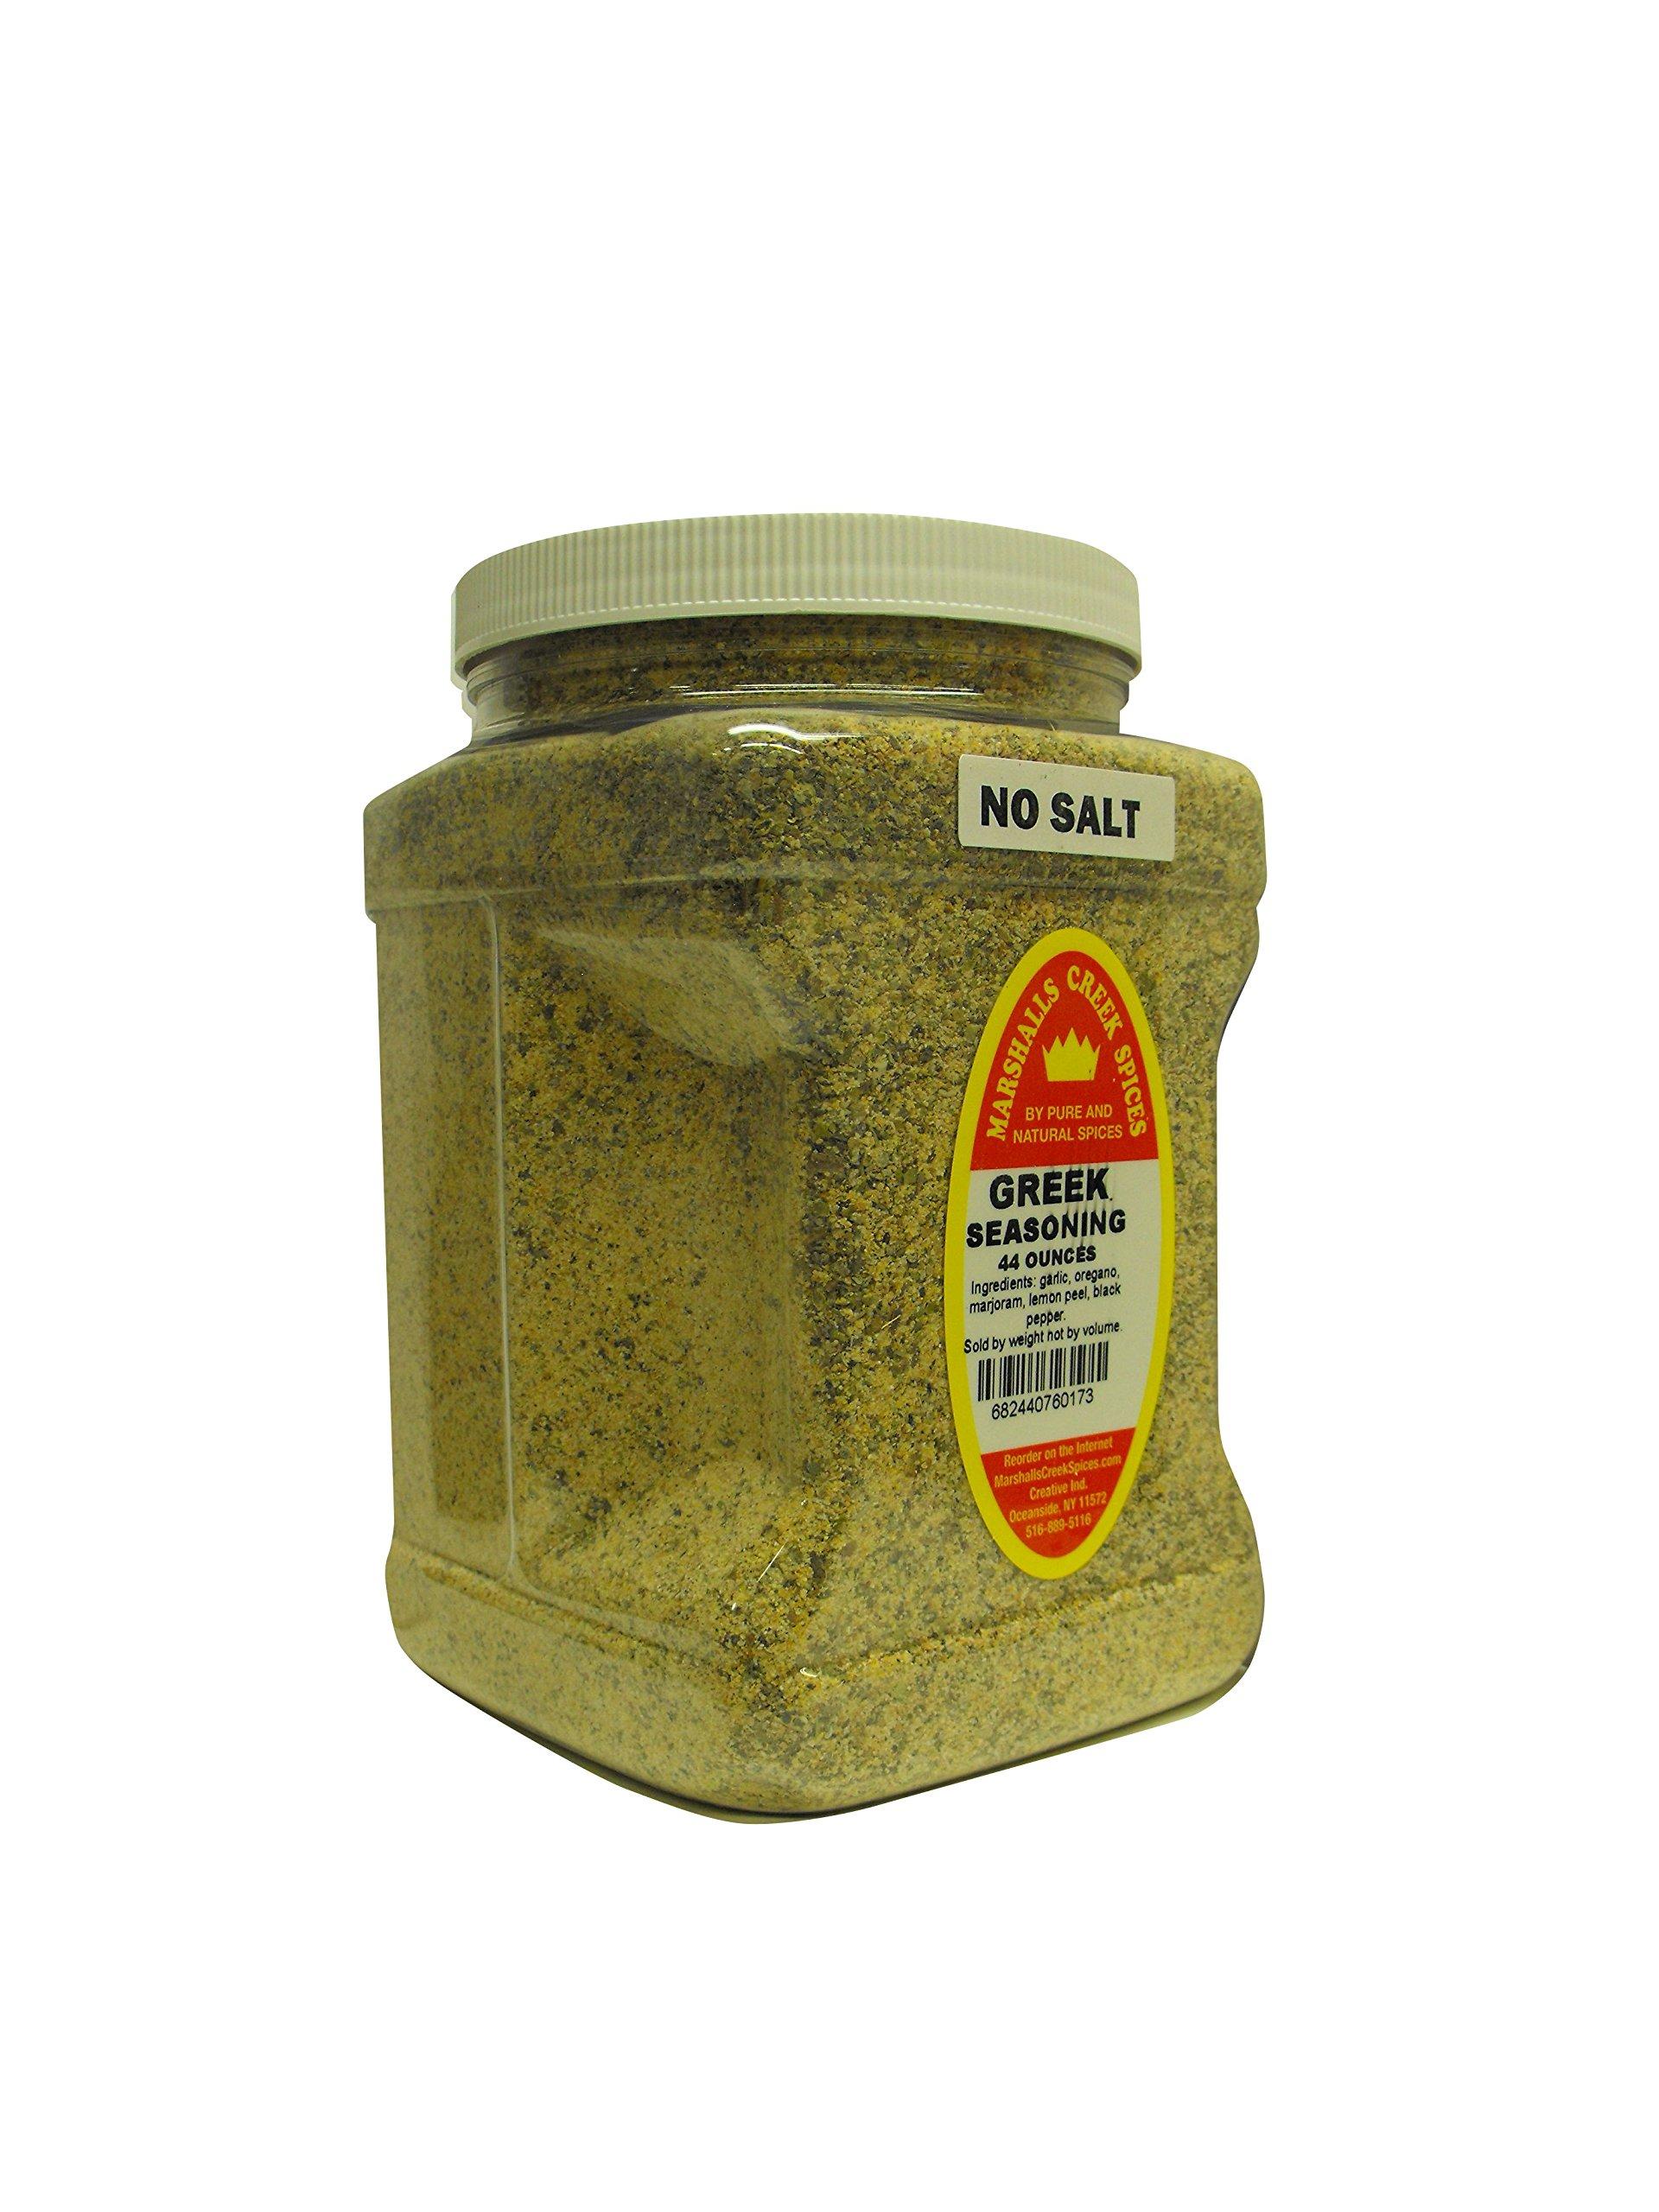 Family Size Marshalls Creek Spices Greek No Salt Seasoning, 40 Ounce ...